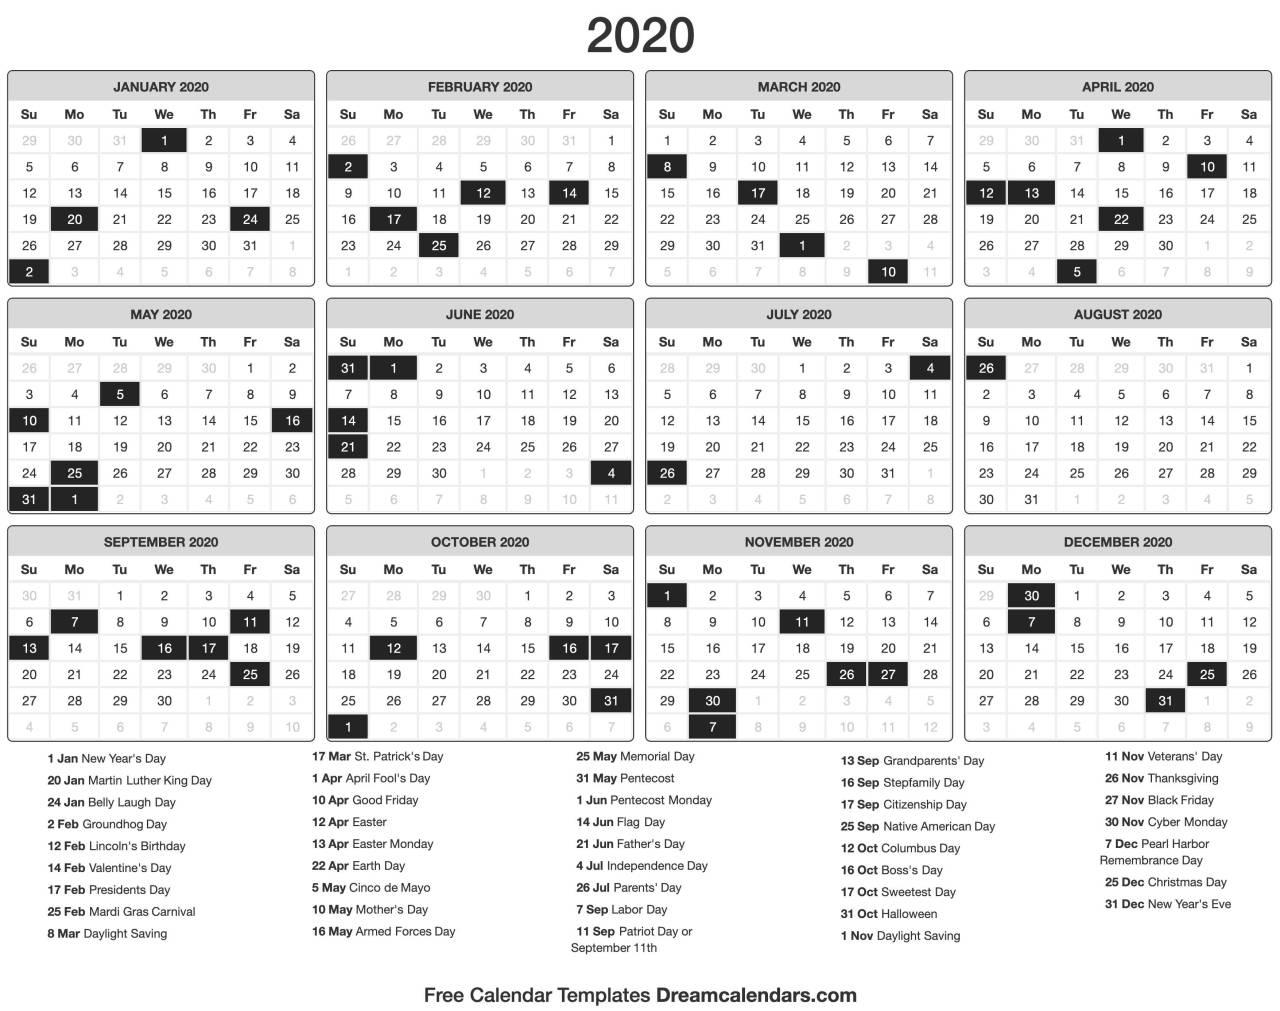 Dream Calendars: Make It 2019 Template — Printable 2020